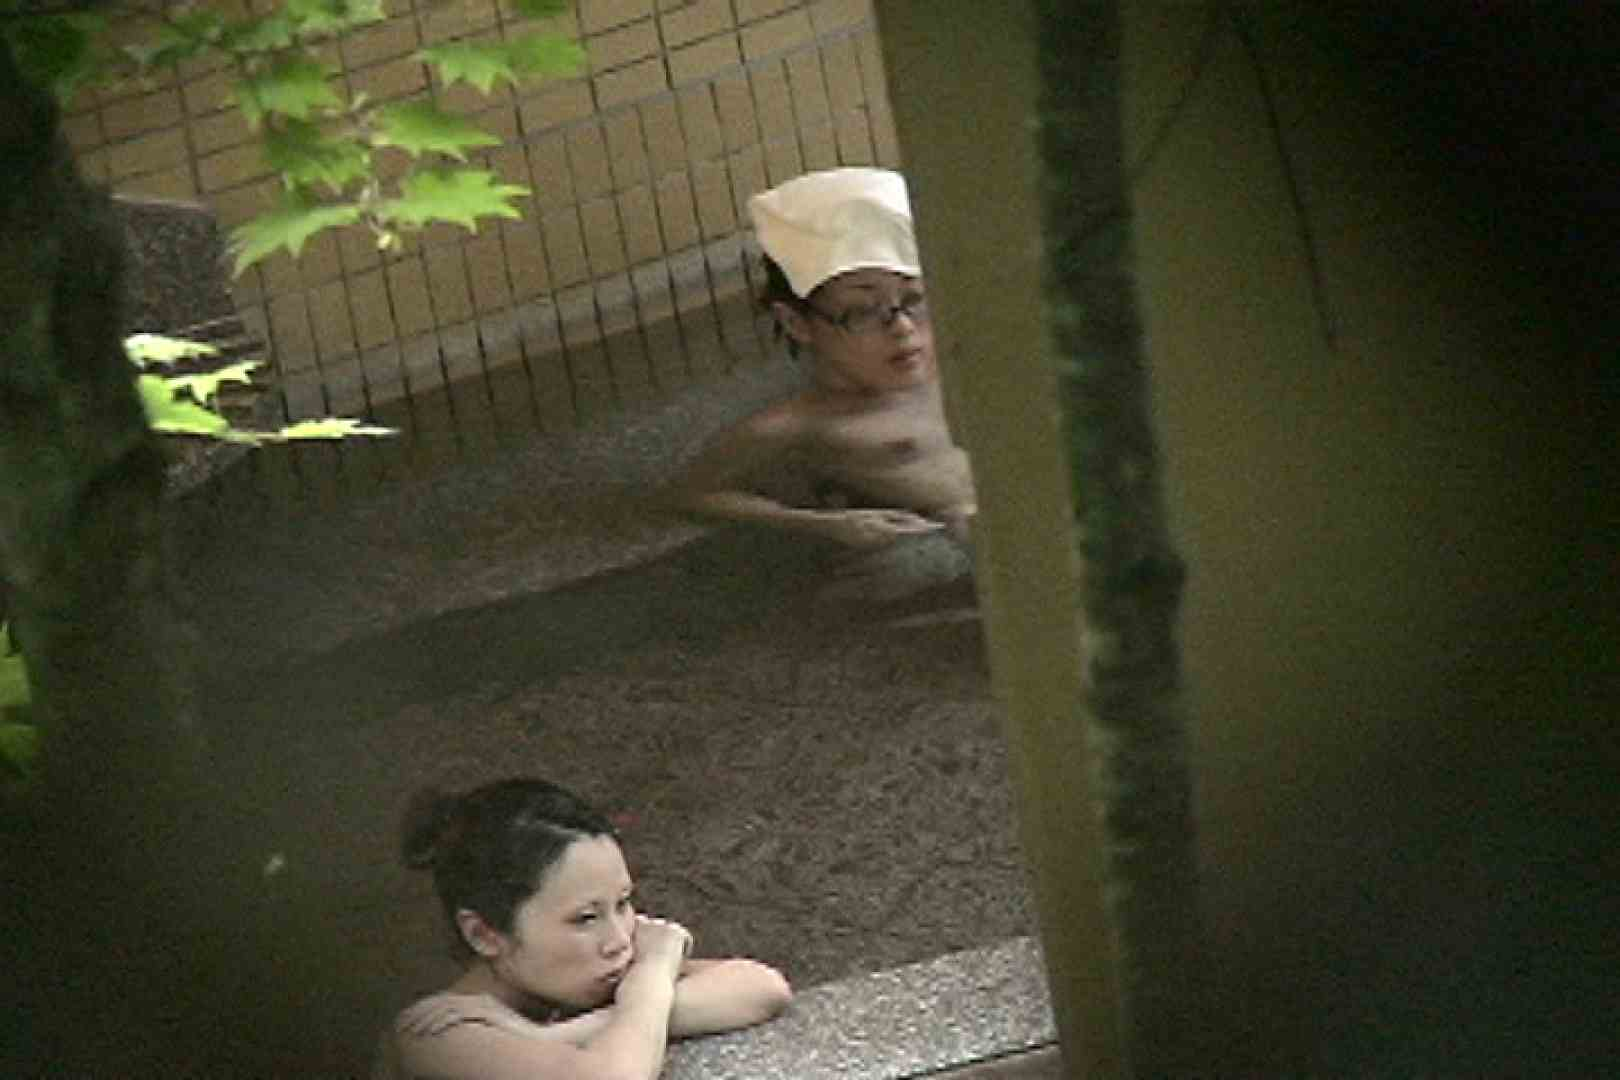 Aquaな露天風呂Vol.707 盗撮大放出 セックス無修正動画無料 34連発 23